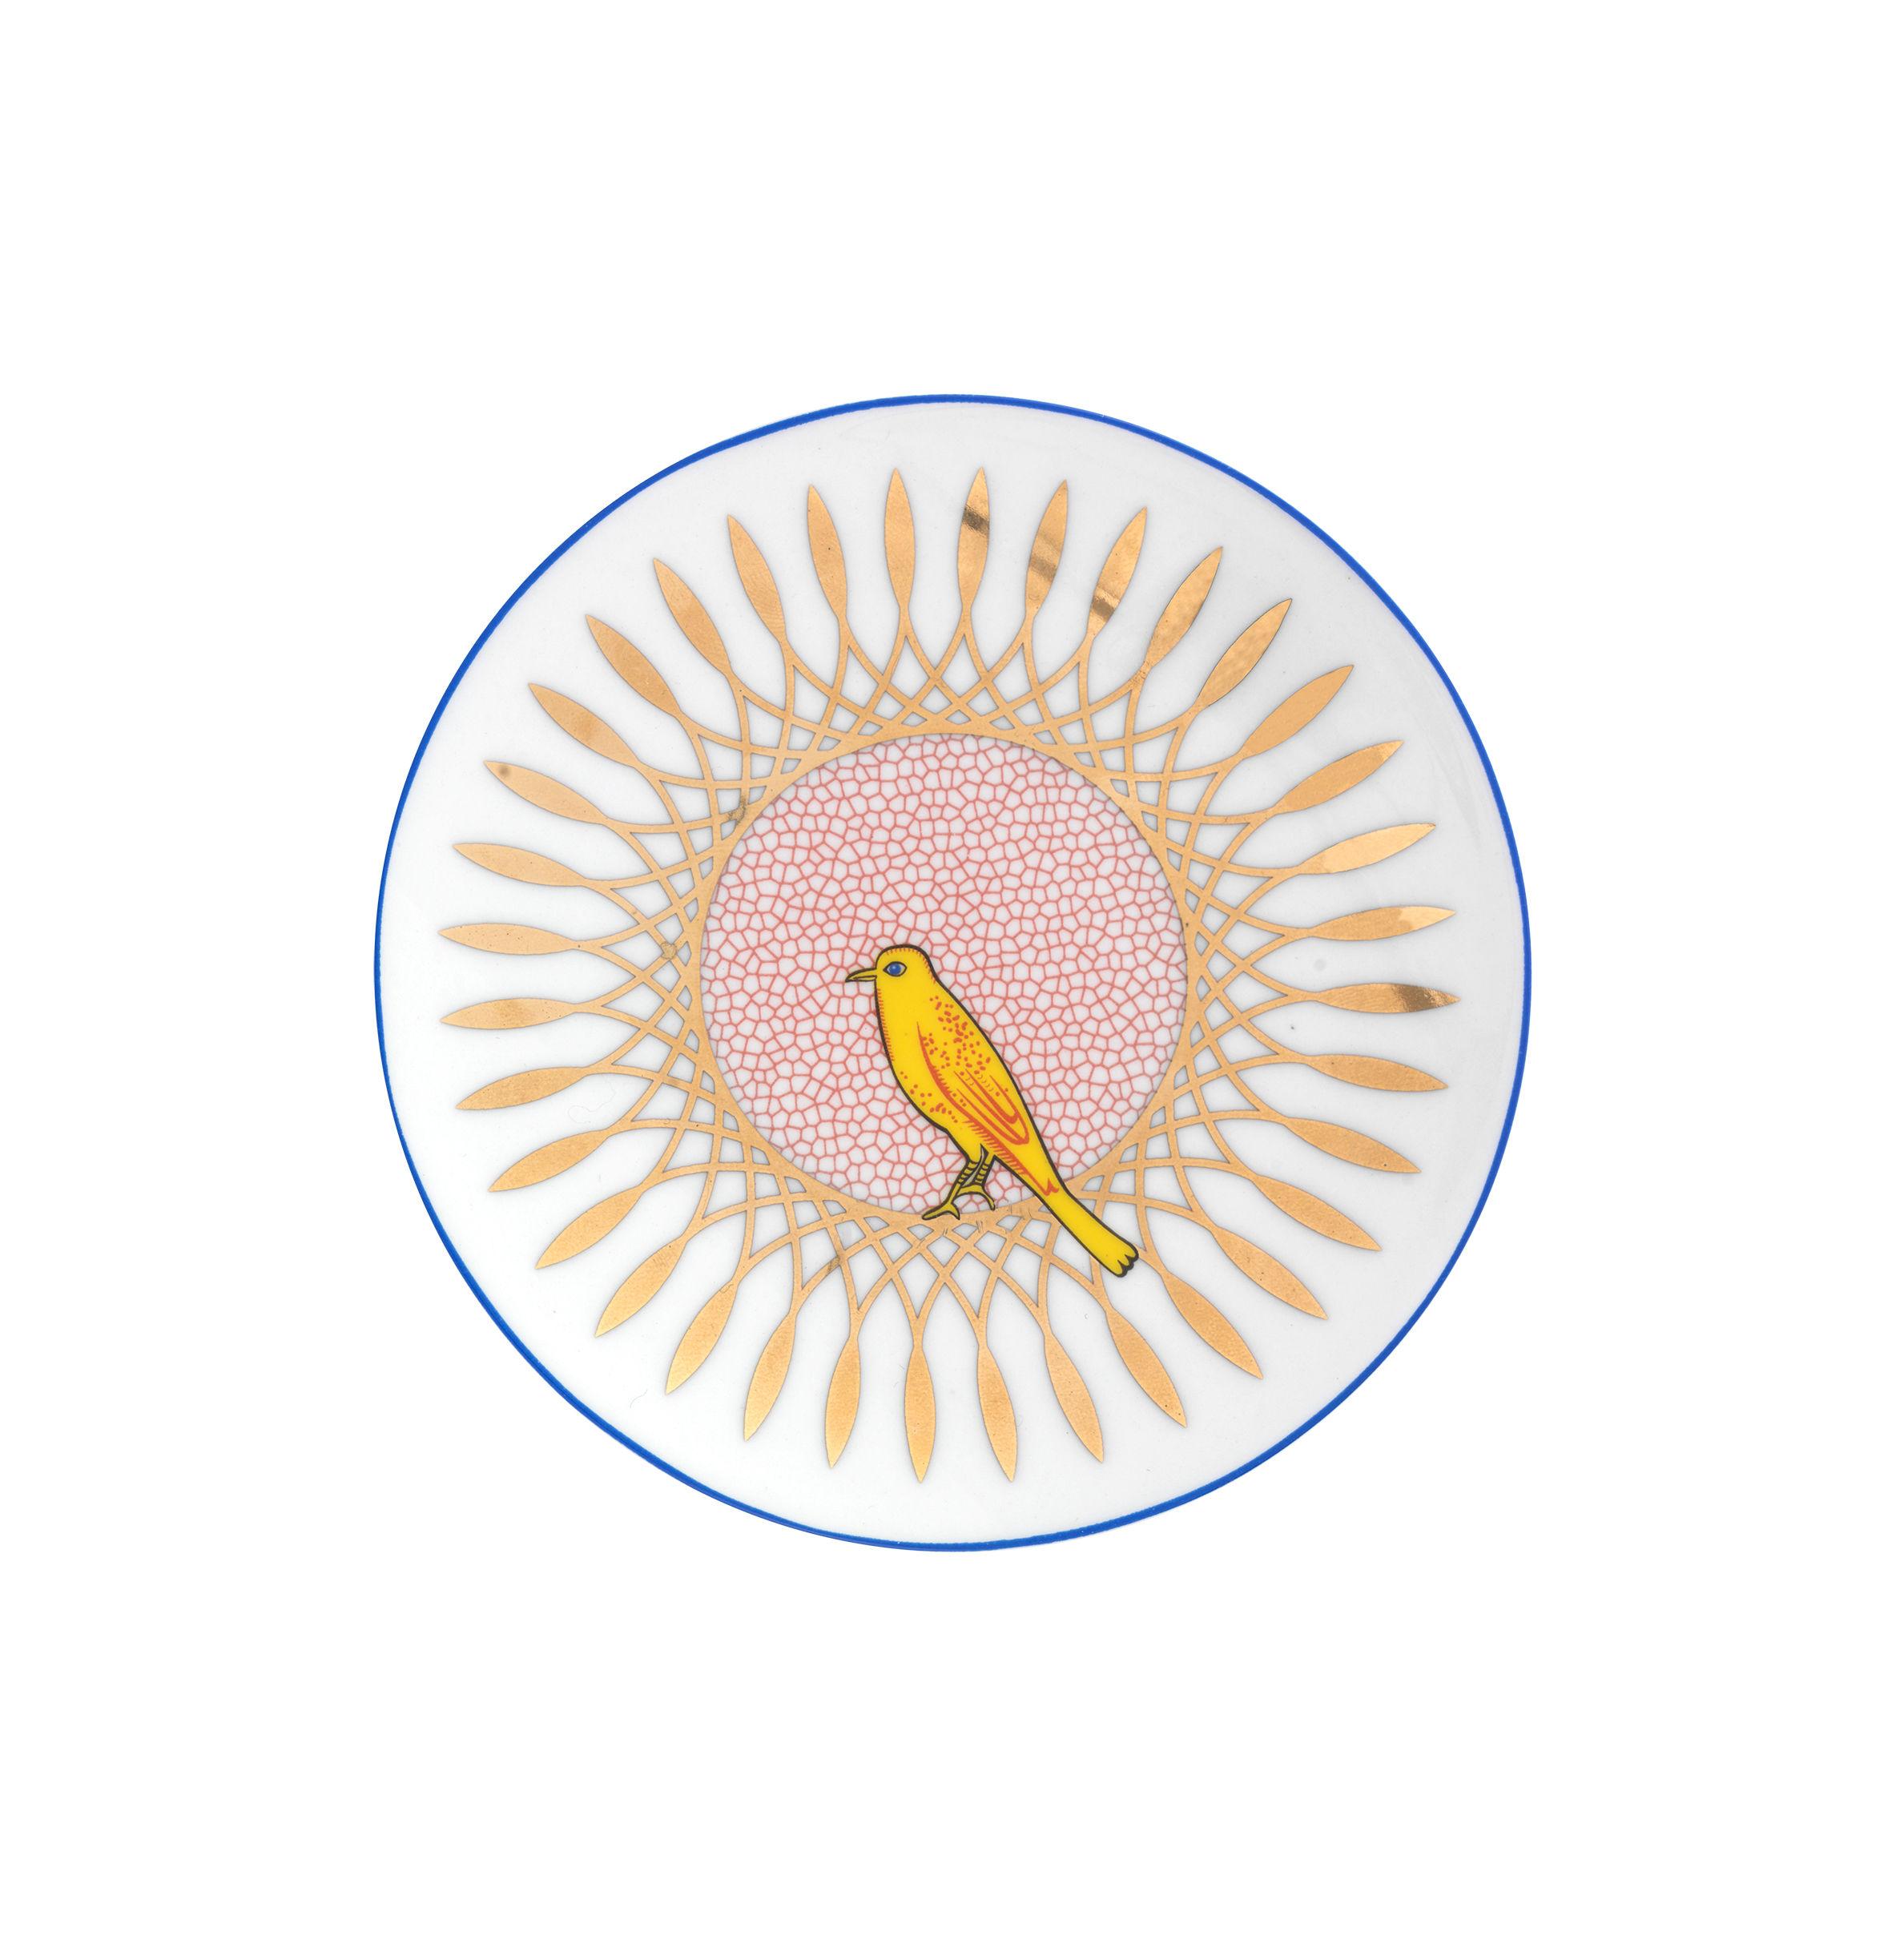 Tavola - Piatti  - Piatto da dessert Bel Paese - Uccellino - / Ø 12 cm di Bitossi Home - Uccello - Porcellana